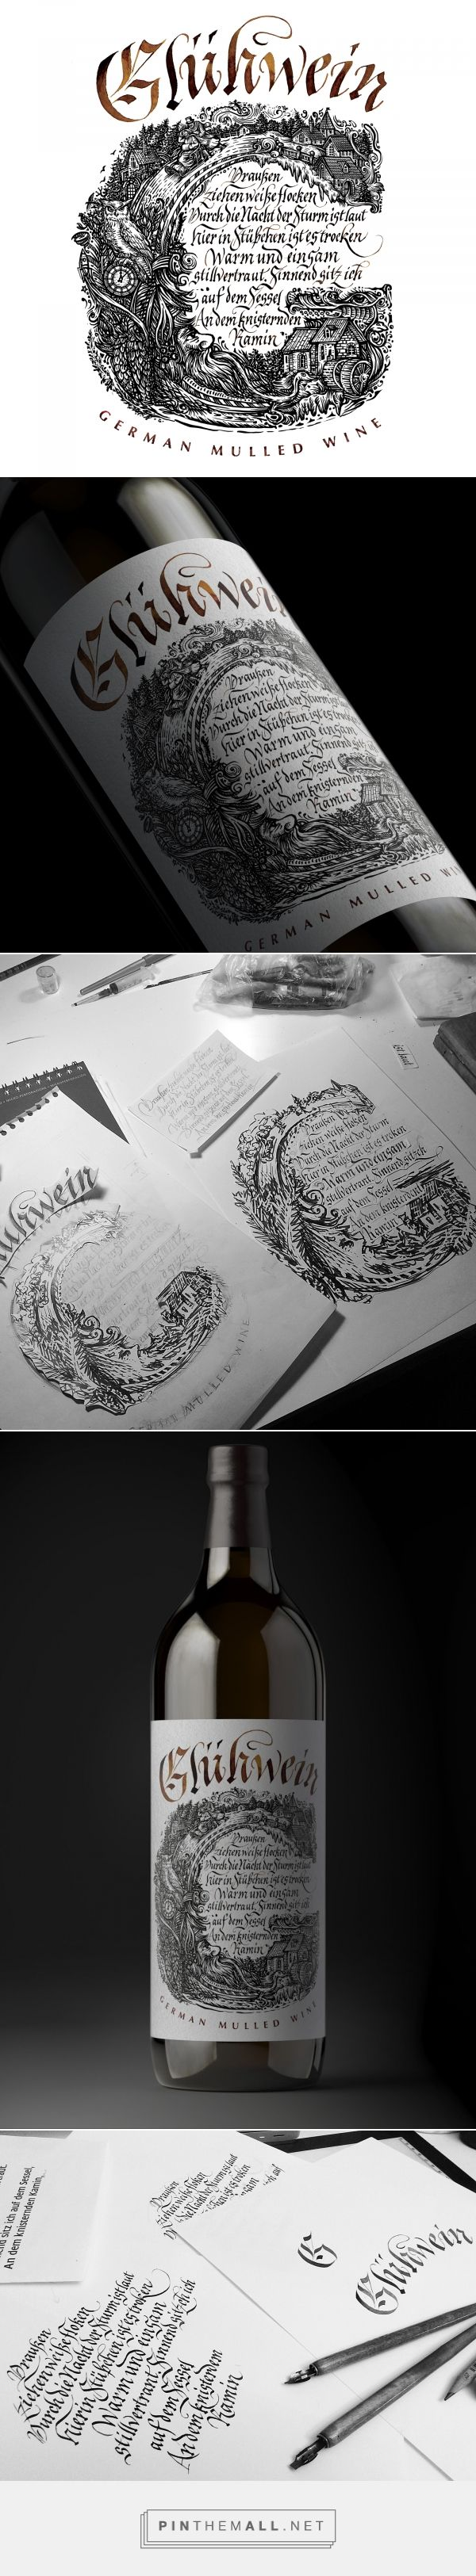 Mulled Wine label design concept by Julia Zhdanova & Vadim Briksin - http://www.packagingoftheworld.com/2016/12/mulled-wine.html